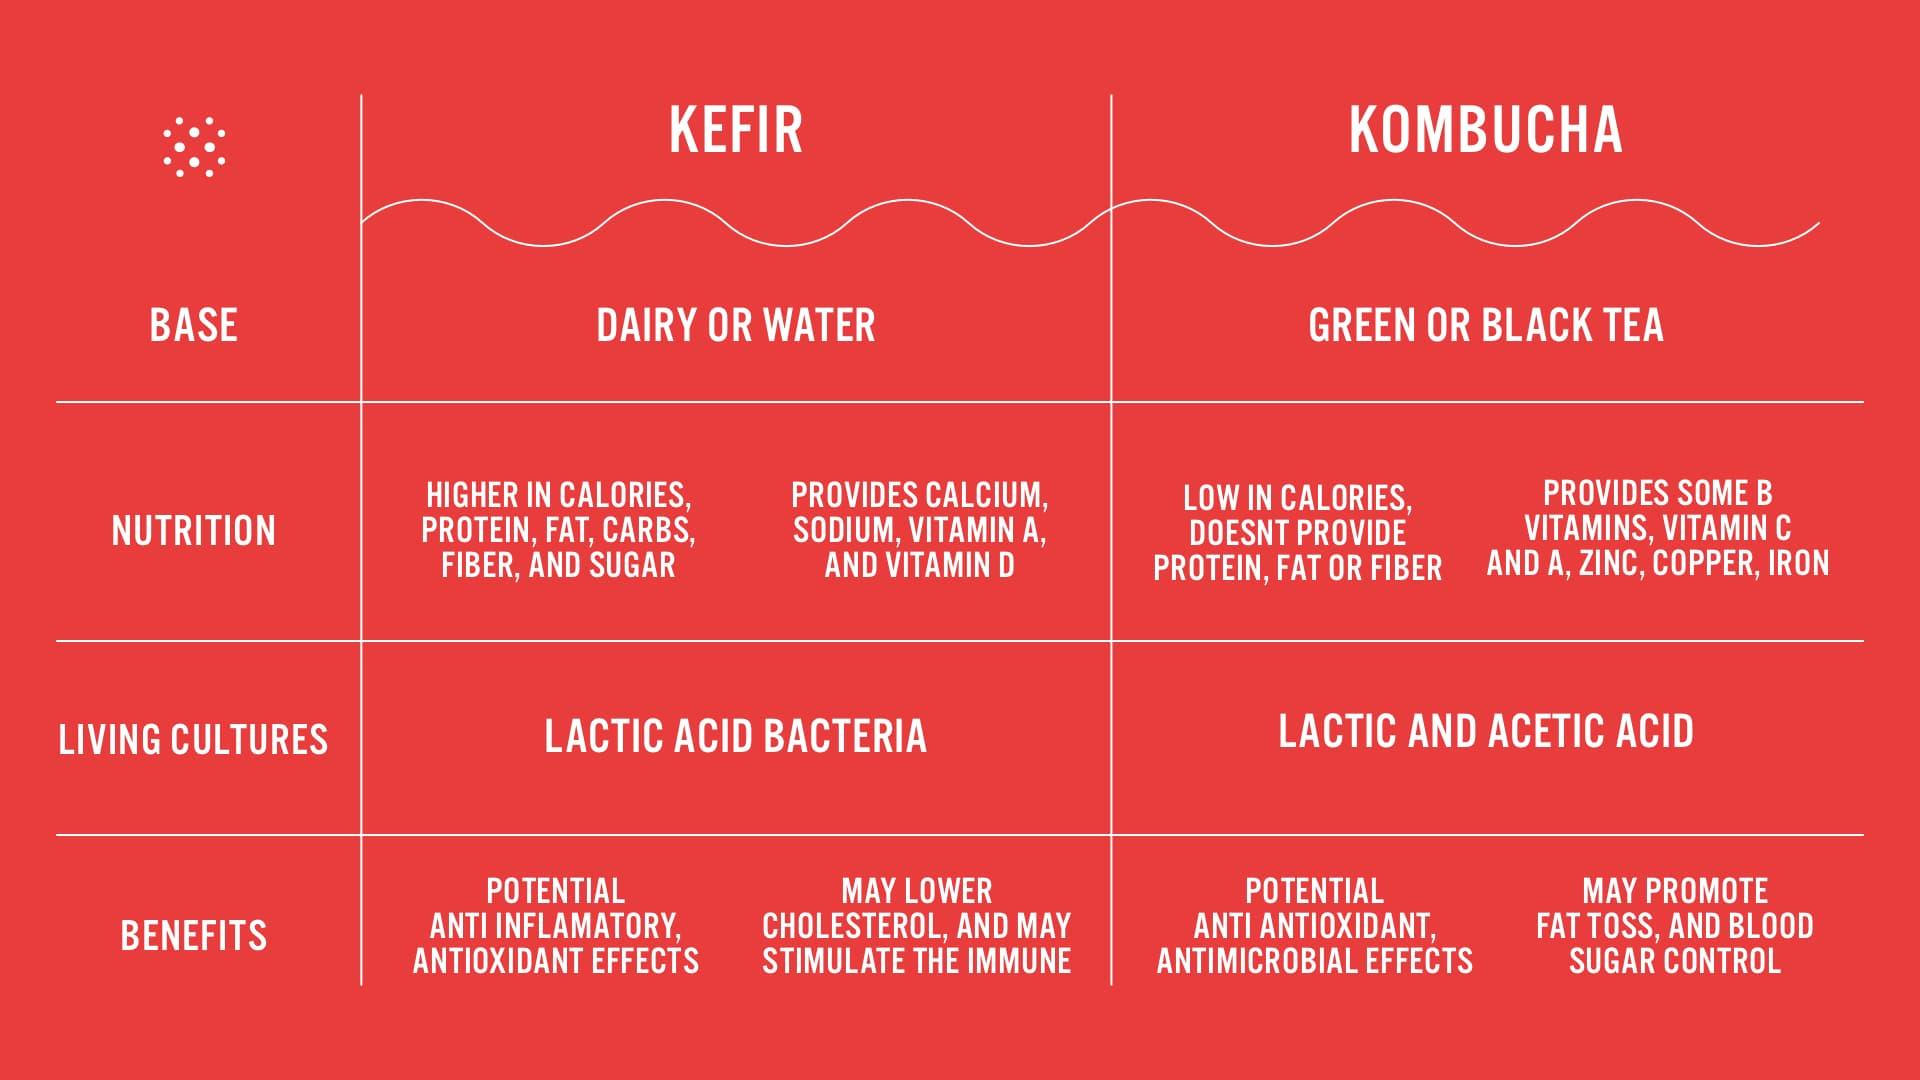 chart comparing kombucha vs kefir